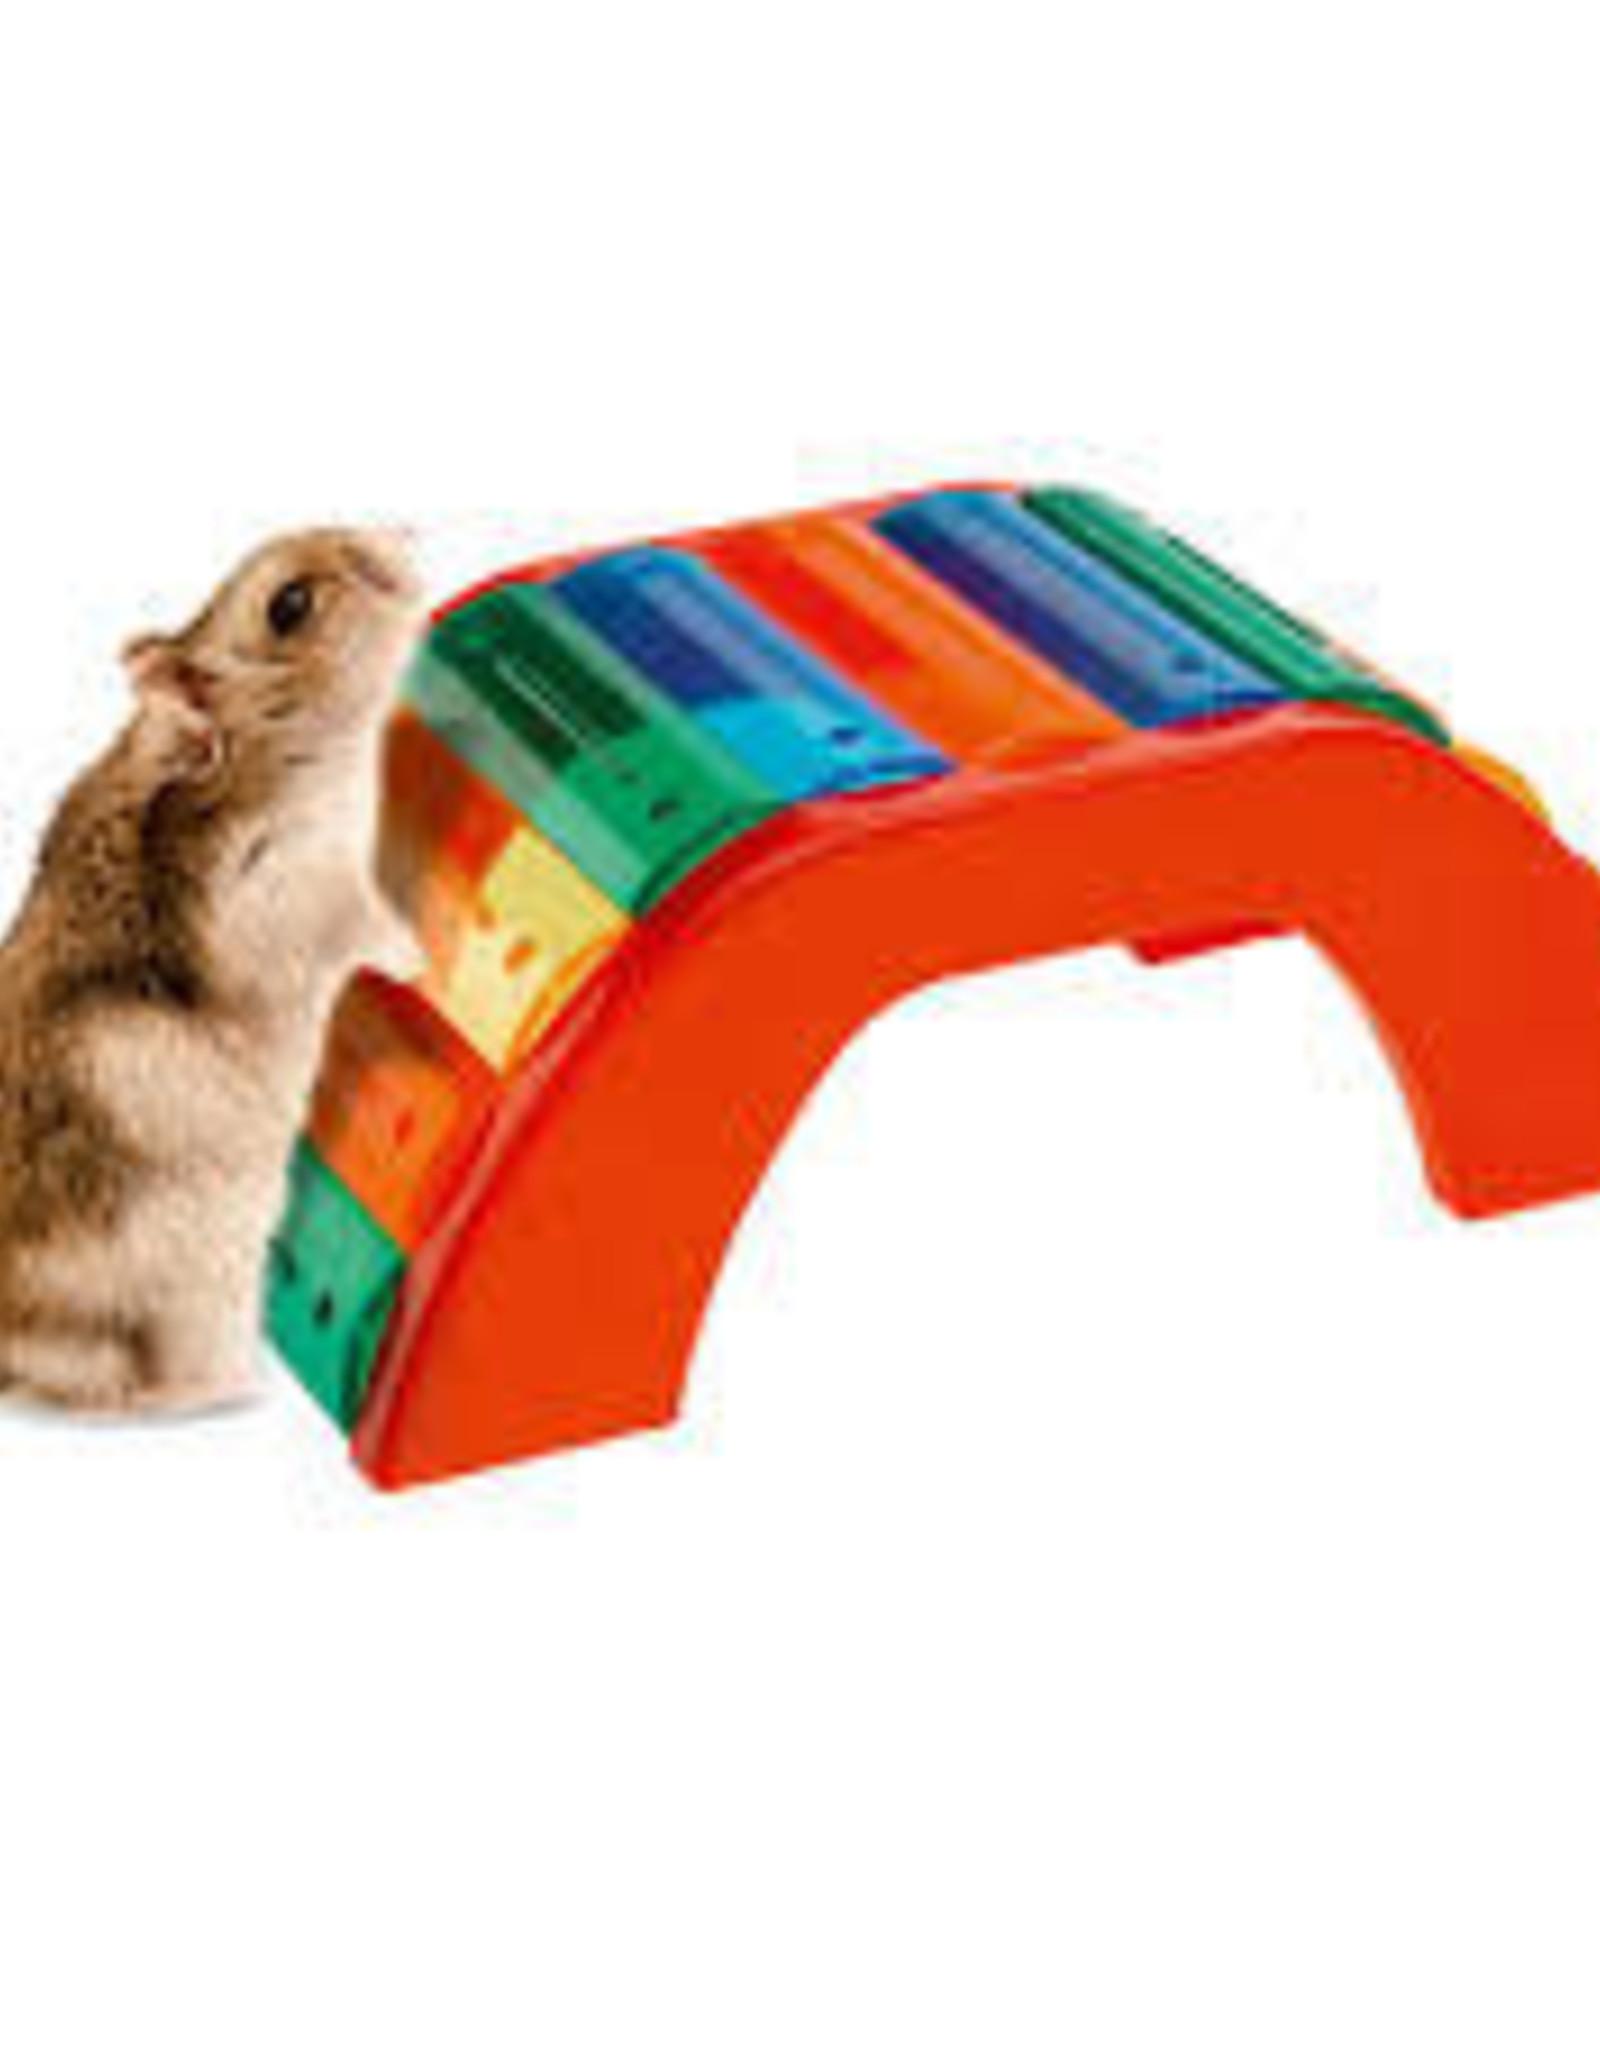 Ferplast Small Animal Multicolour Toy Bridge